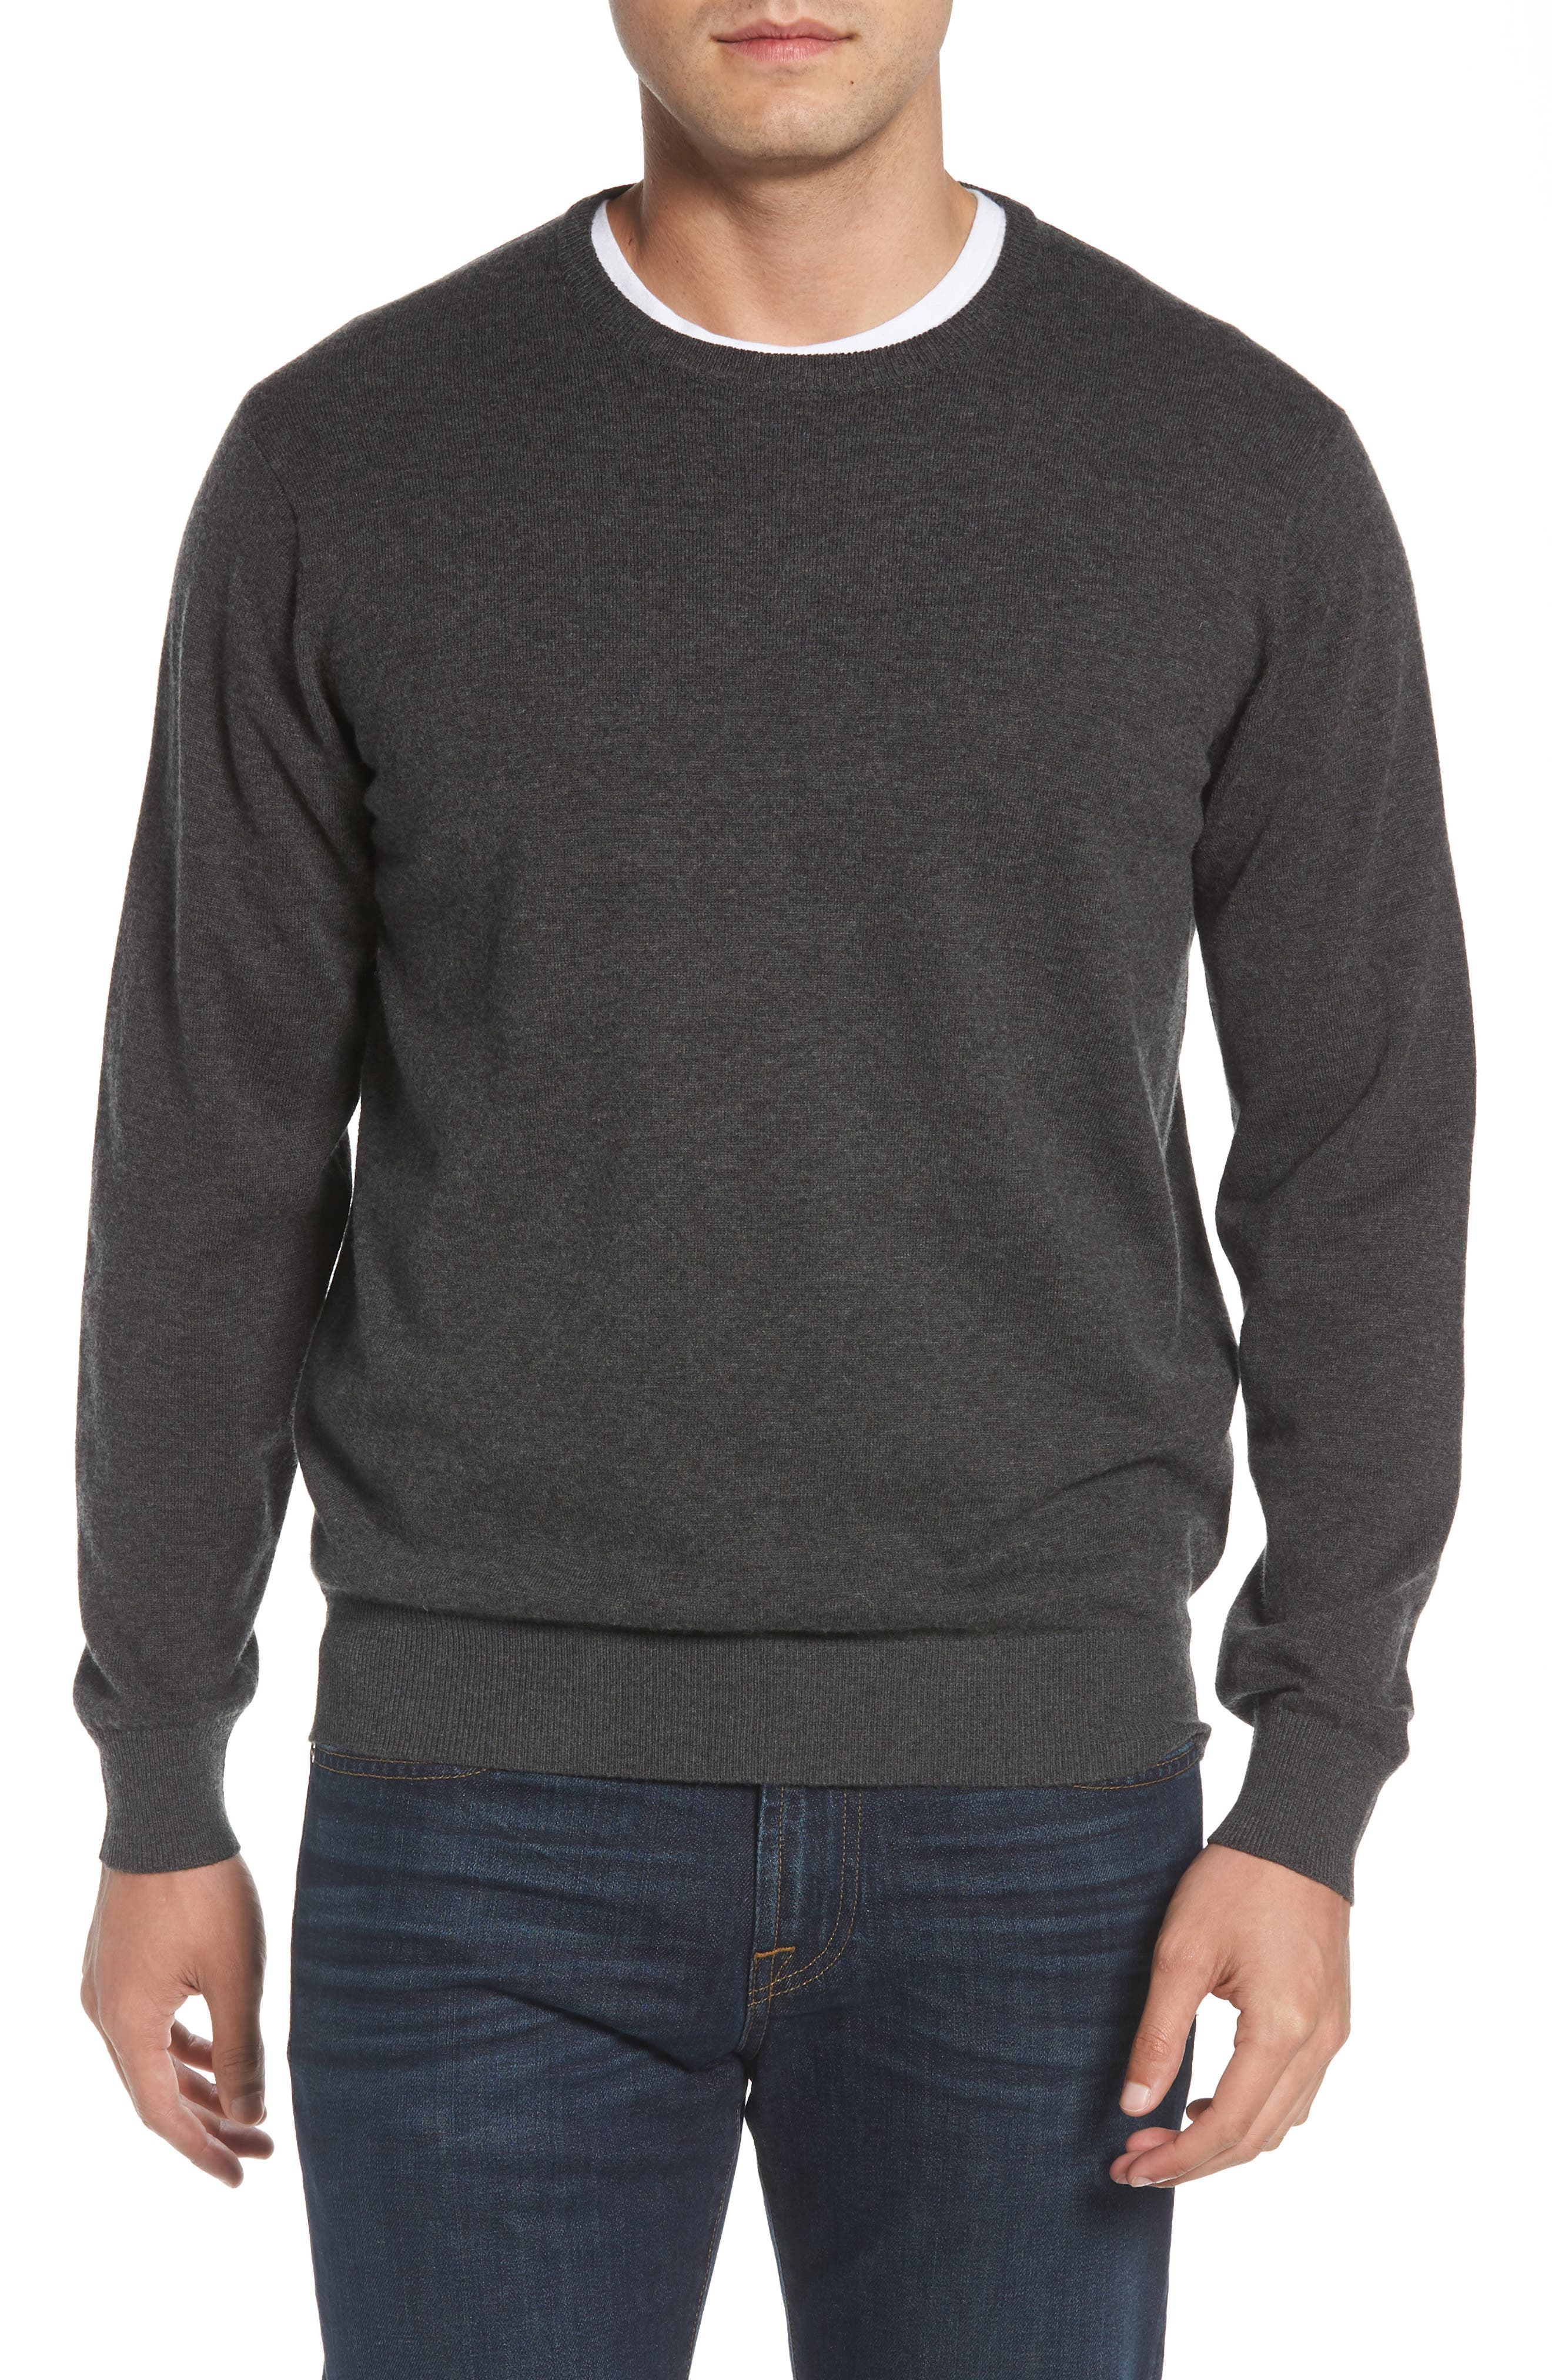 Wool & Cotton Crewneck Sweater,                             Main thumbnail 1, color,                             022